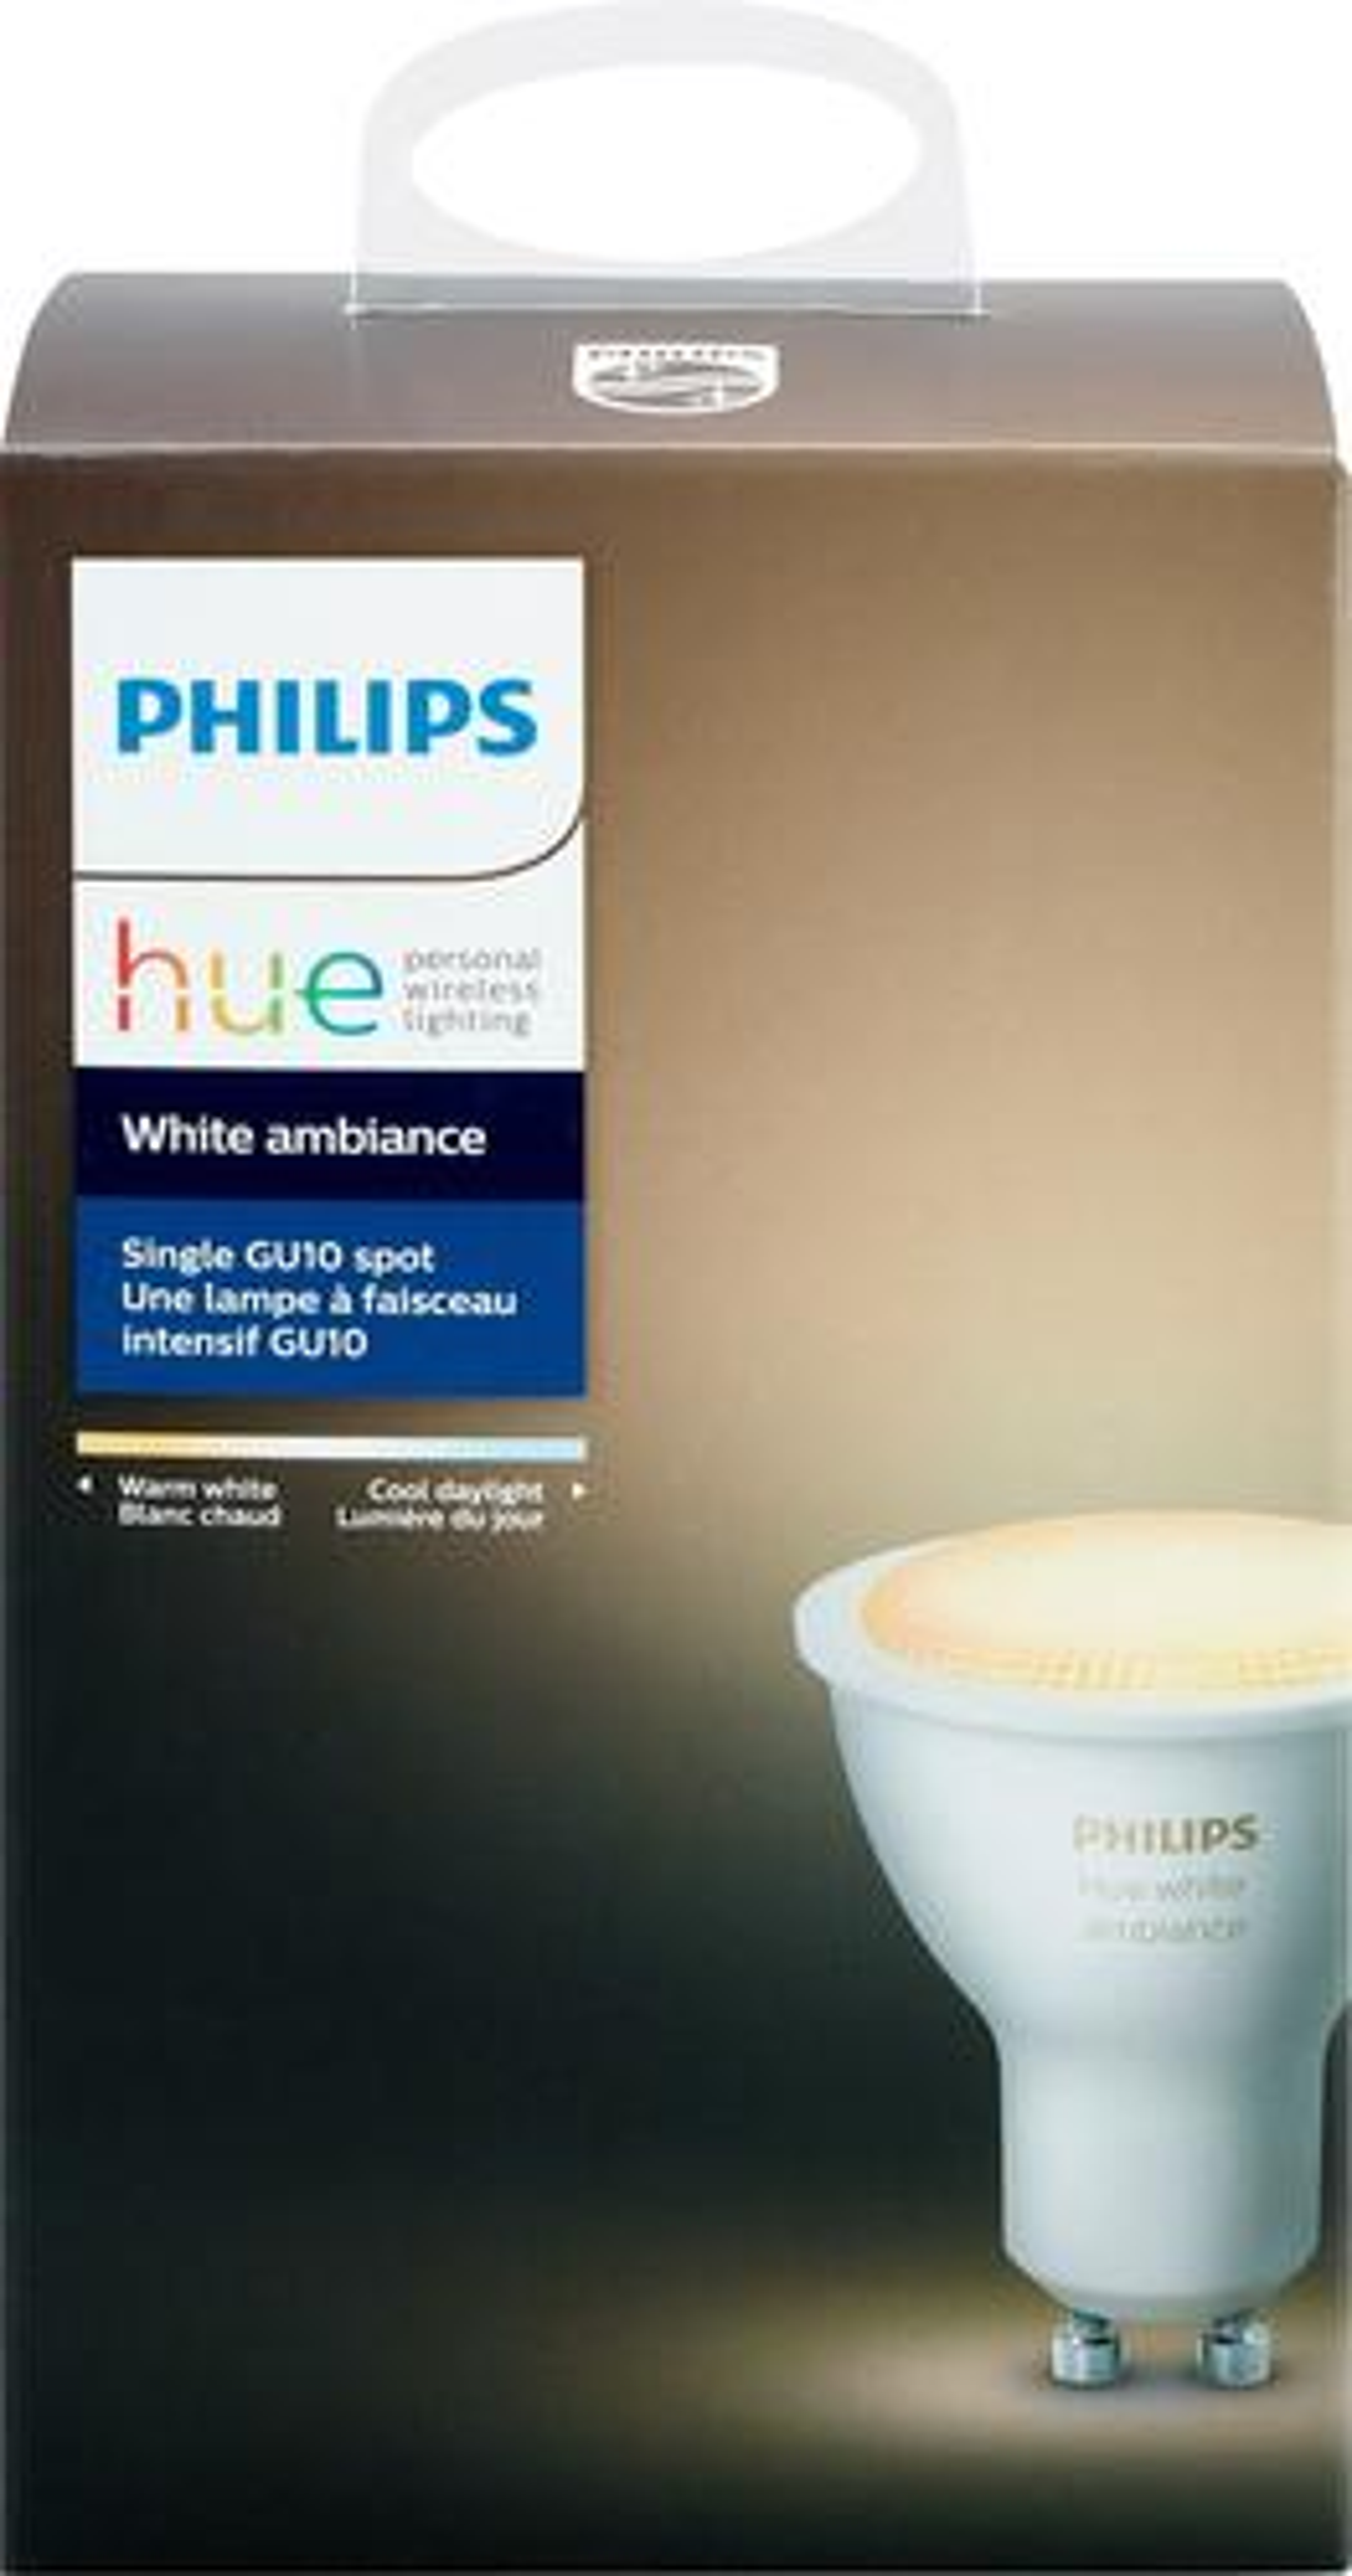 Philips - Hue White Ambiance GU10 Wi-Fi Smart LED Bulb - White